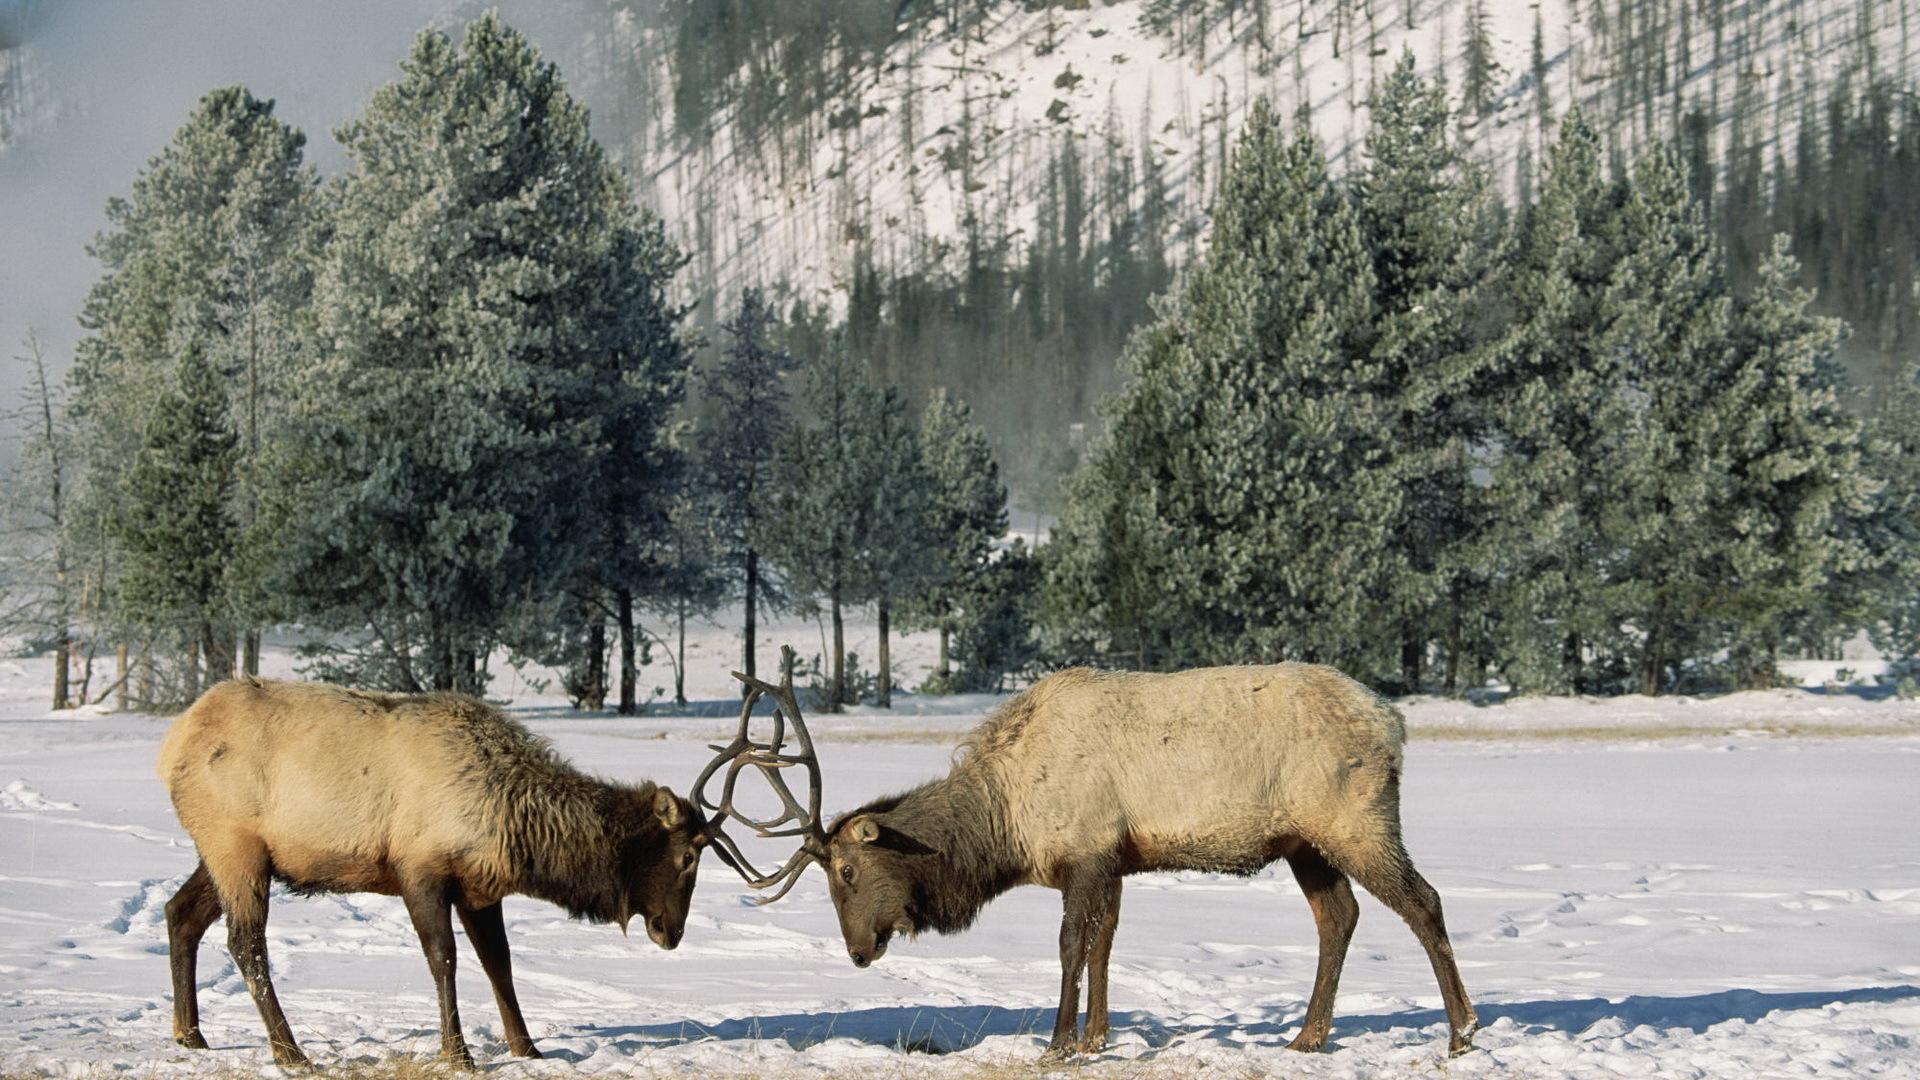 winter snow steam deer antlers fight HD Desktop Wallpapers 1920x1080